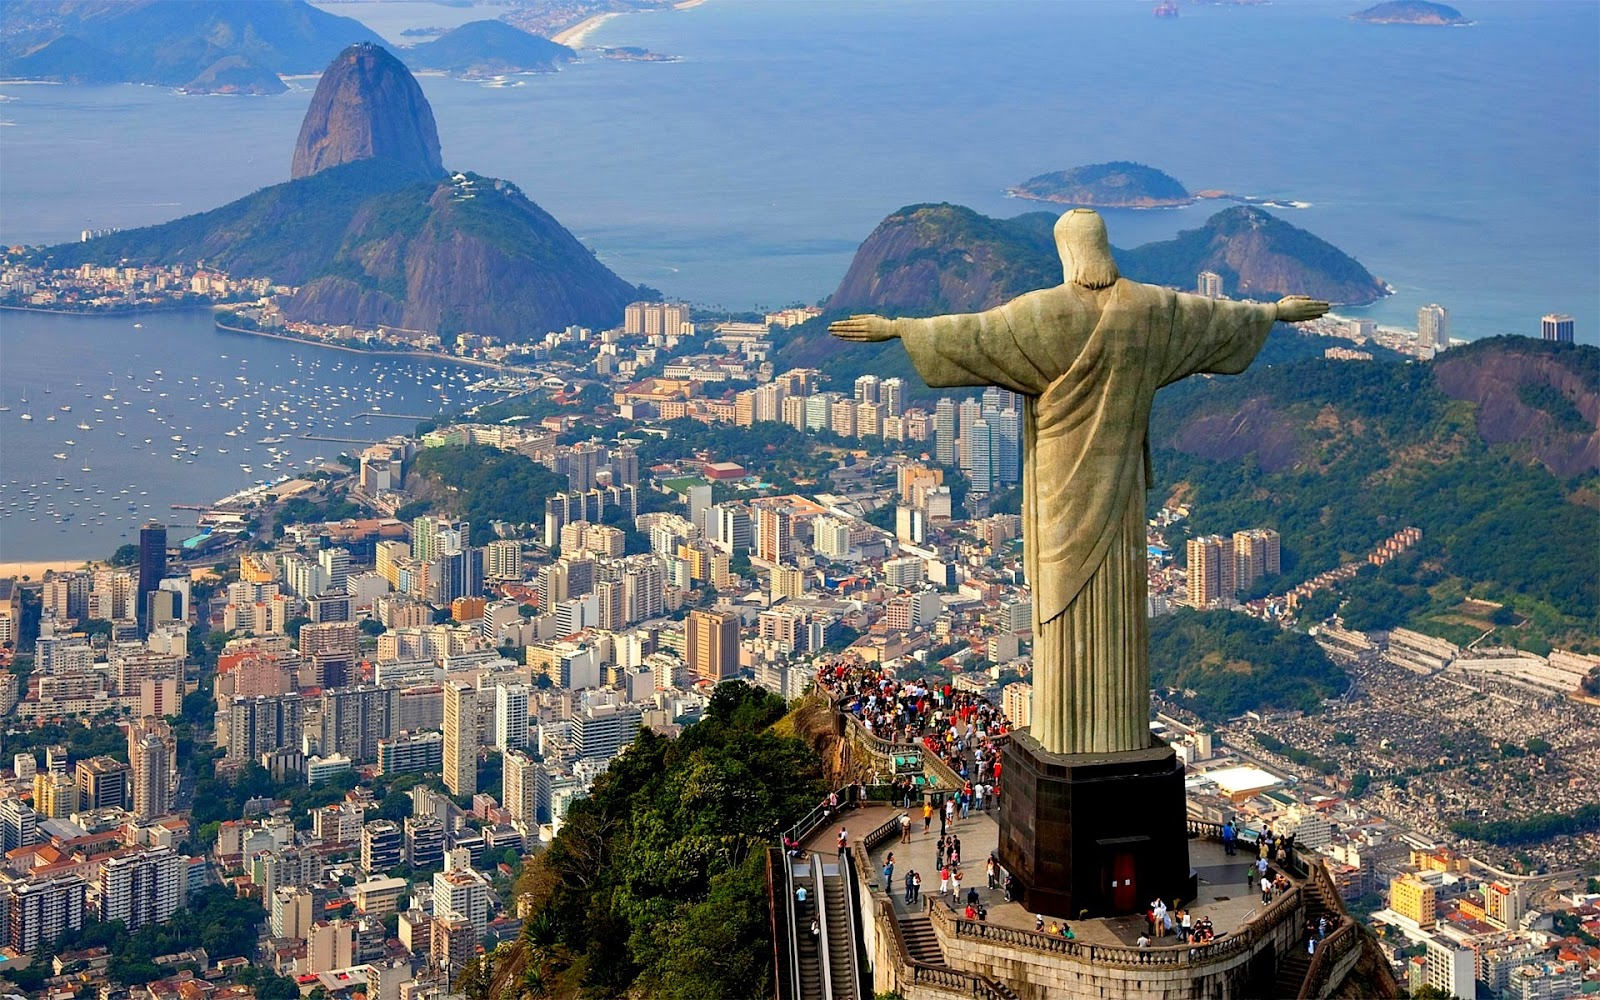 Art Deco Statue - Christ the Redeemer, Rio de Janeiro, Brazil